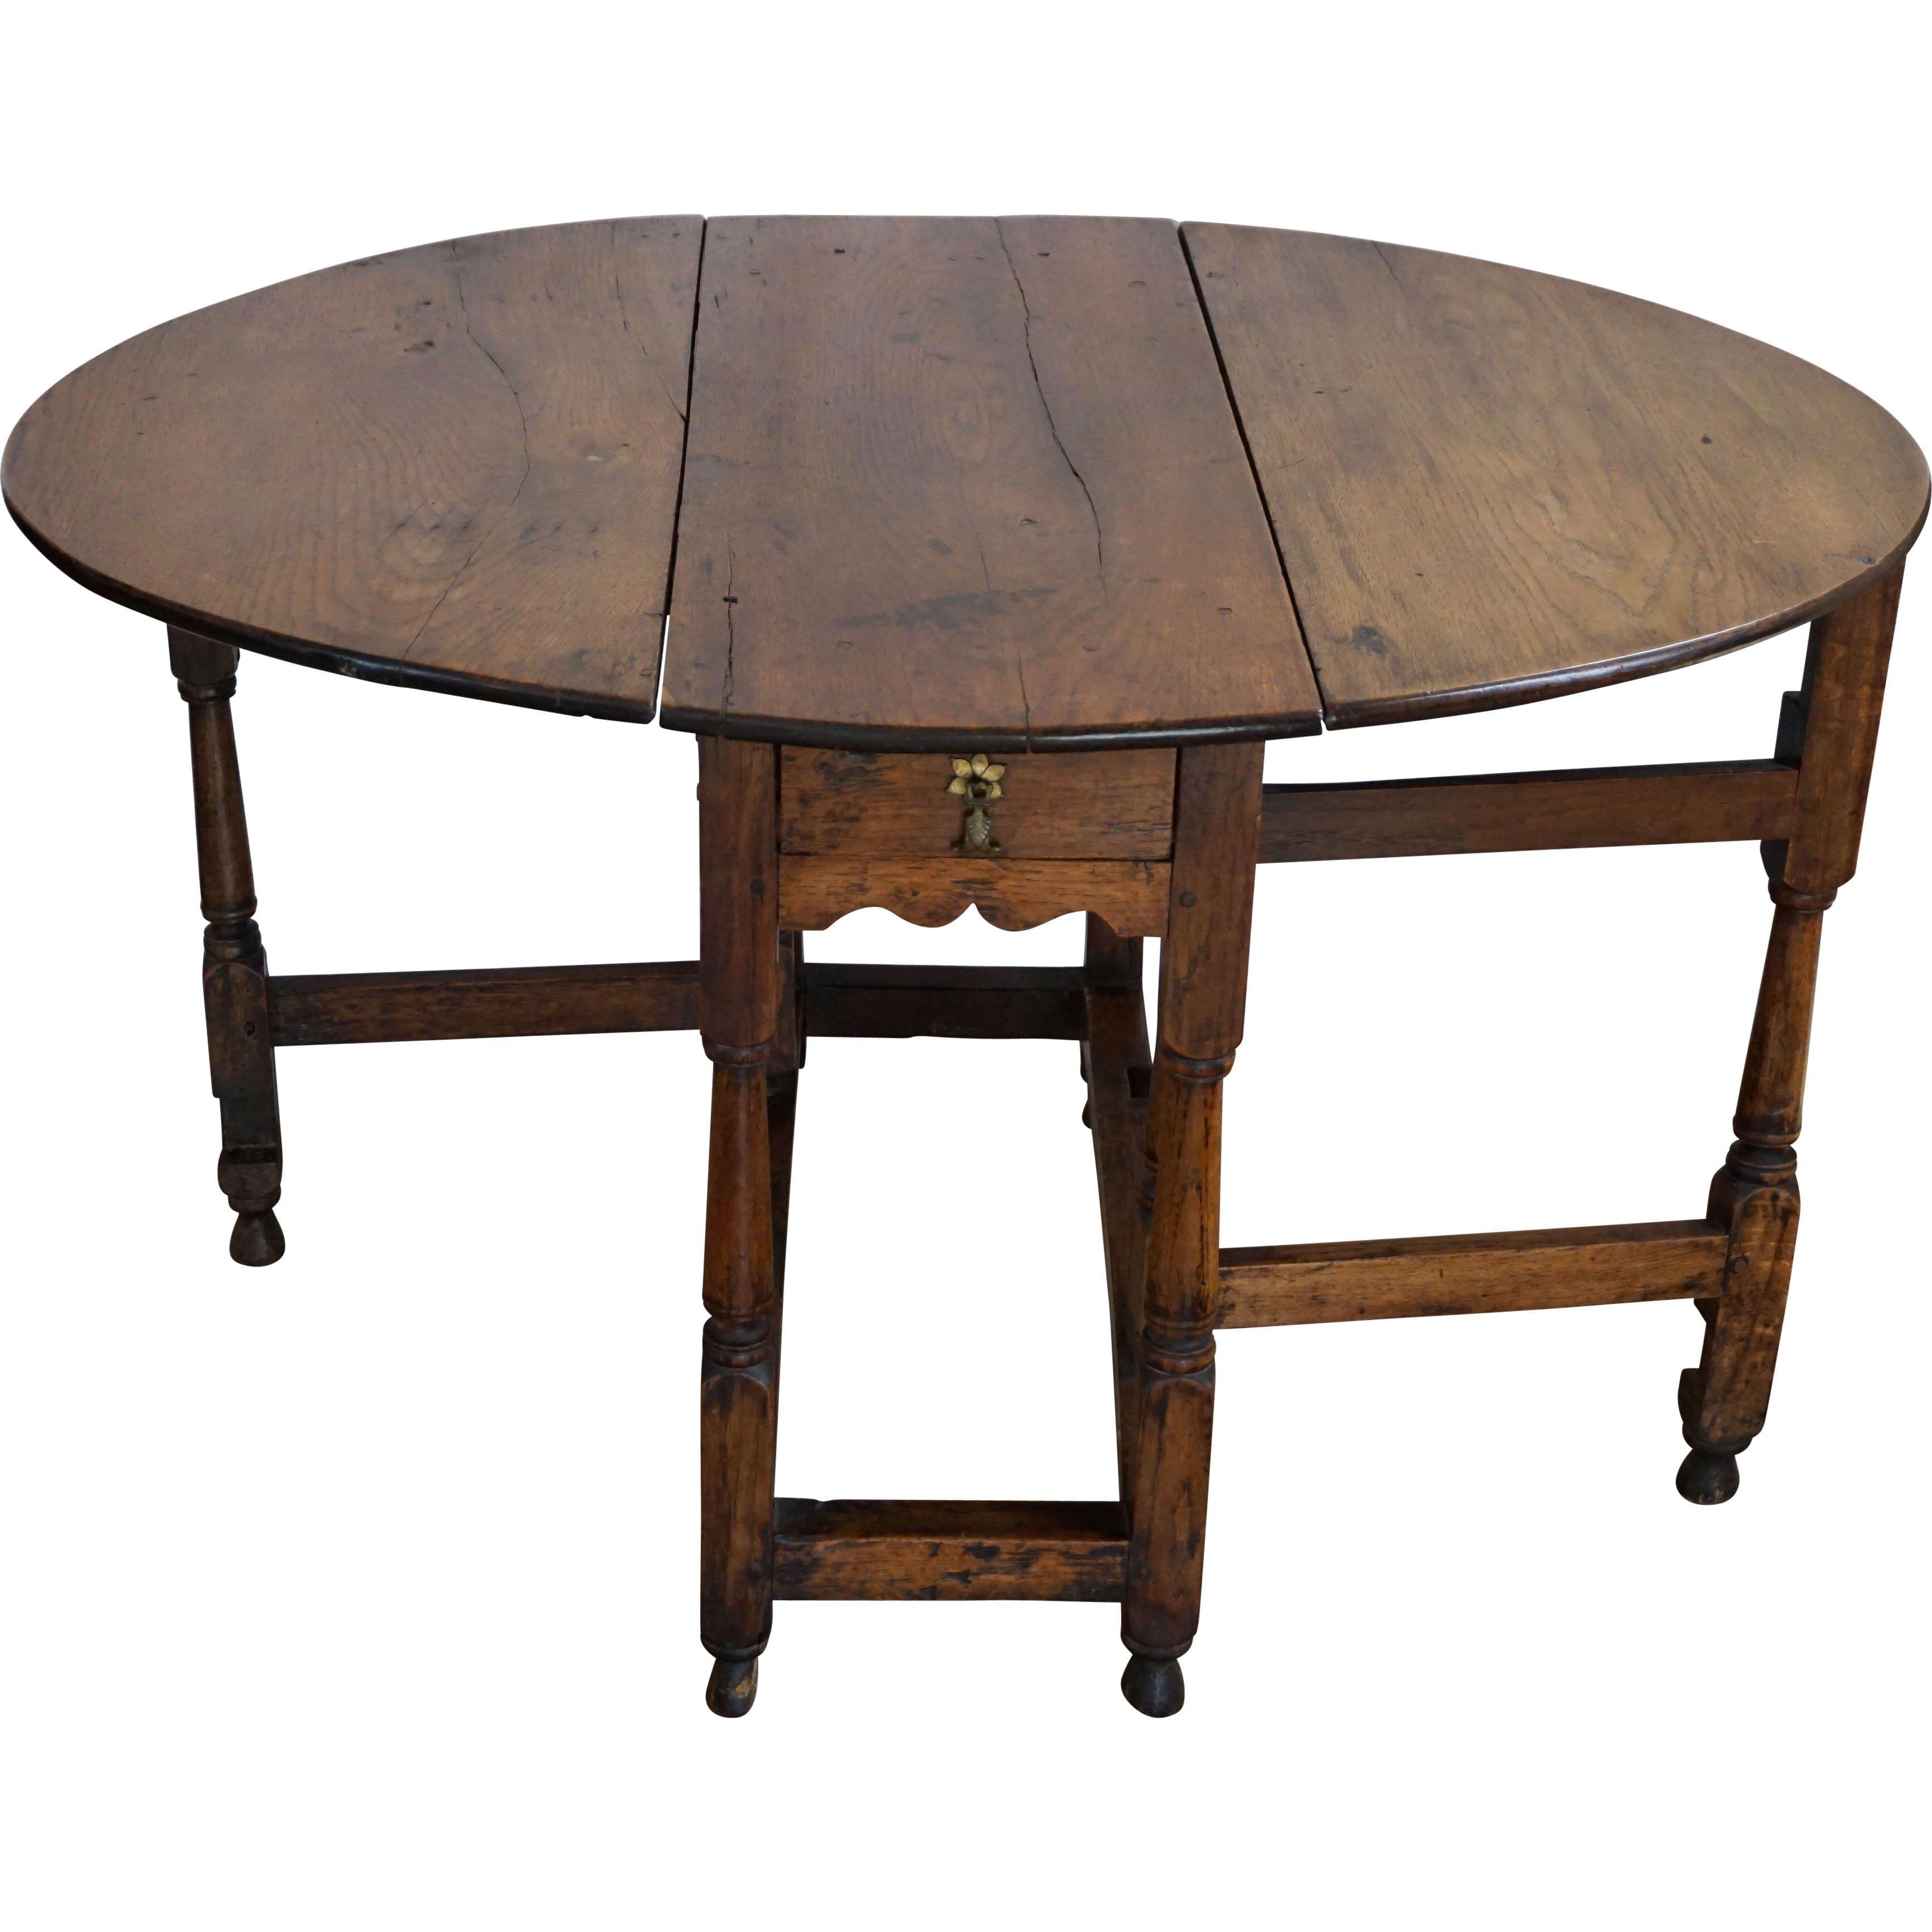 Superb 18th Century English Oak Drop Leaf Gateleg Table   Image 13 Of 13